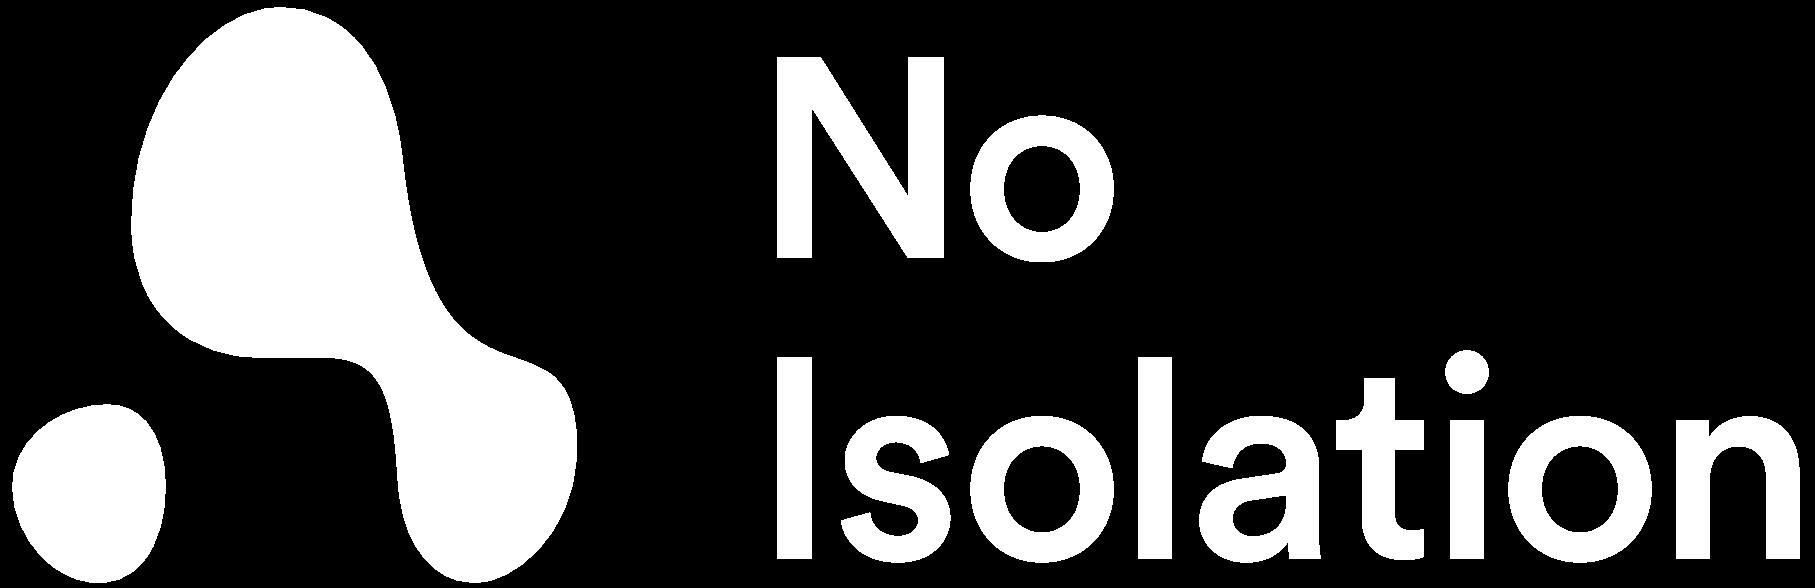 No Isolation logo